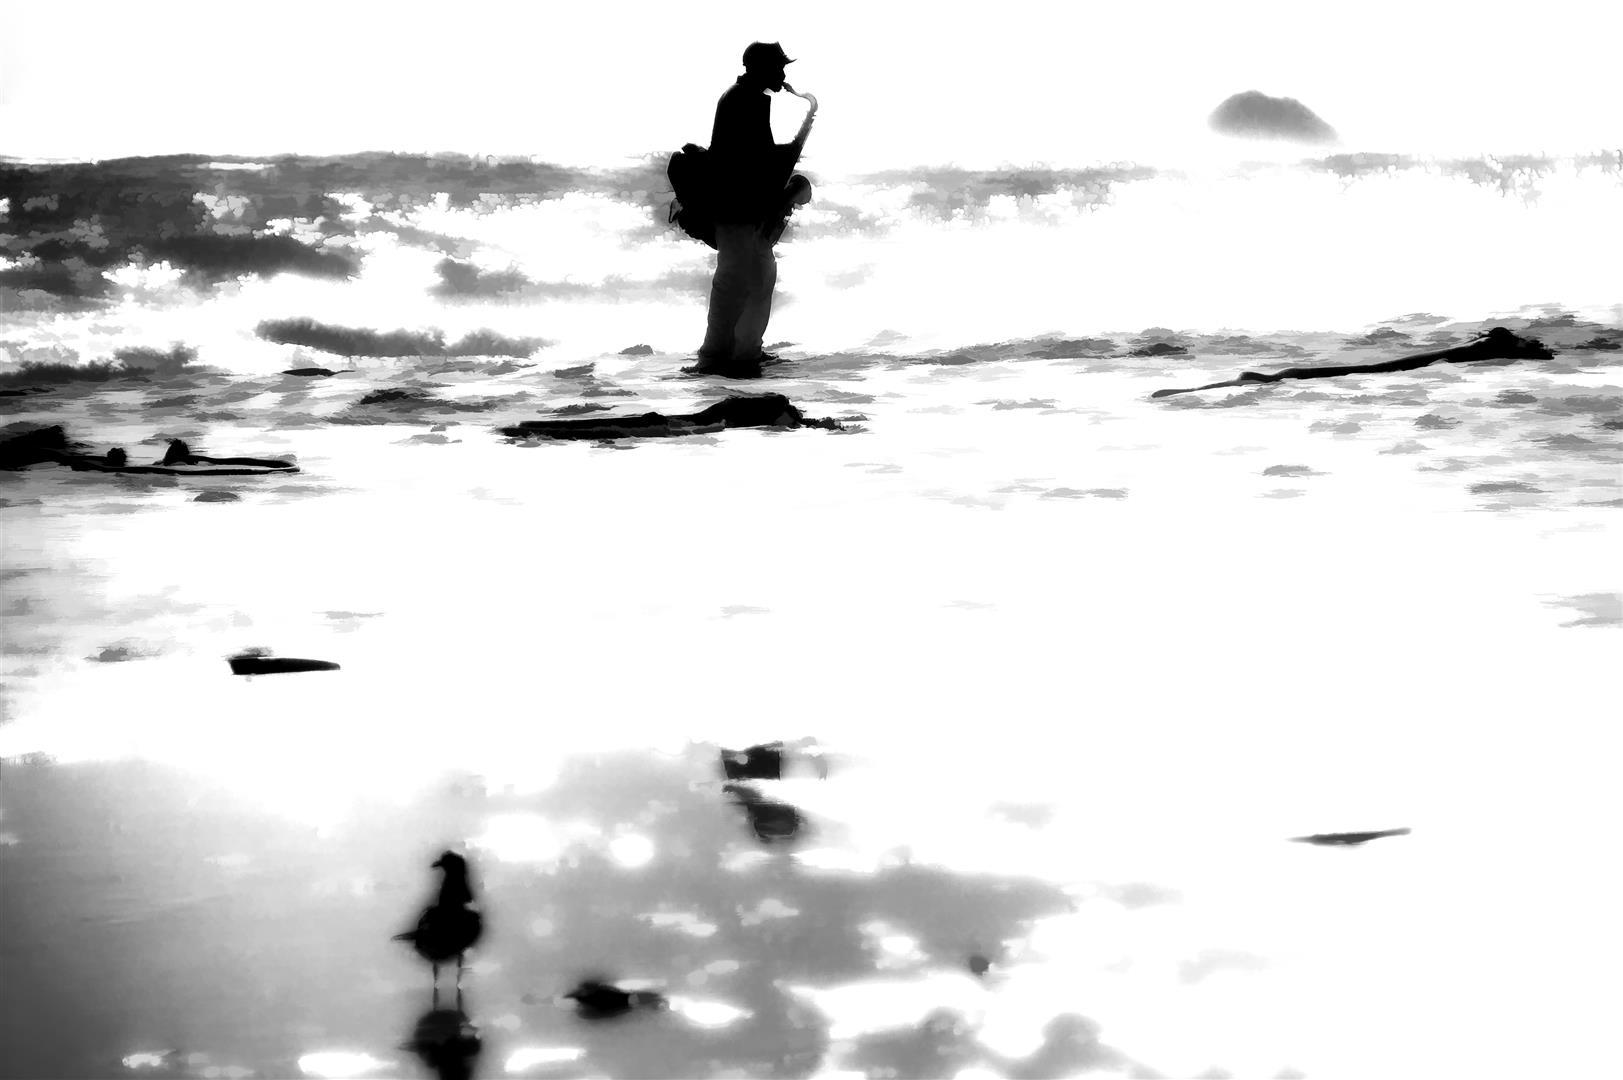 Sax-On-The-Beach (Large)